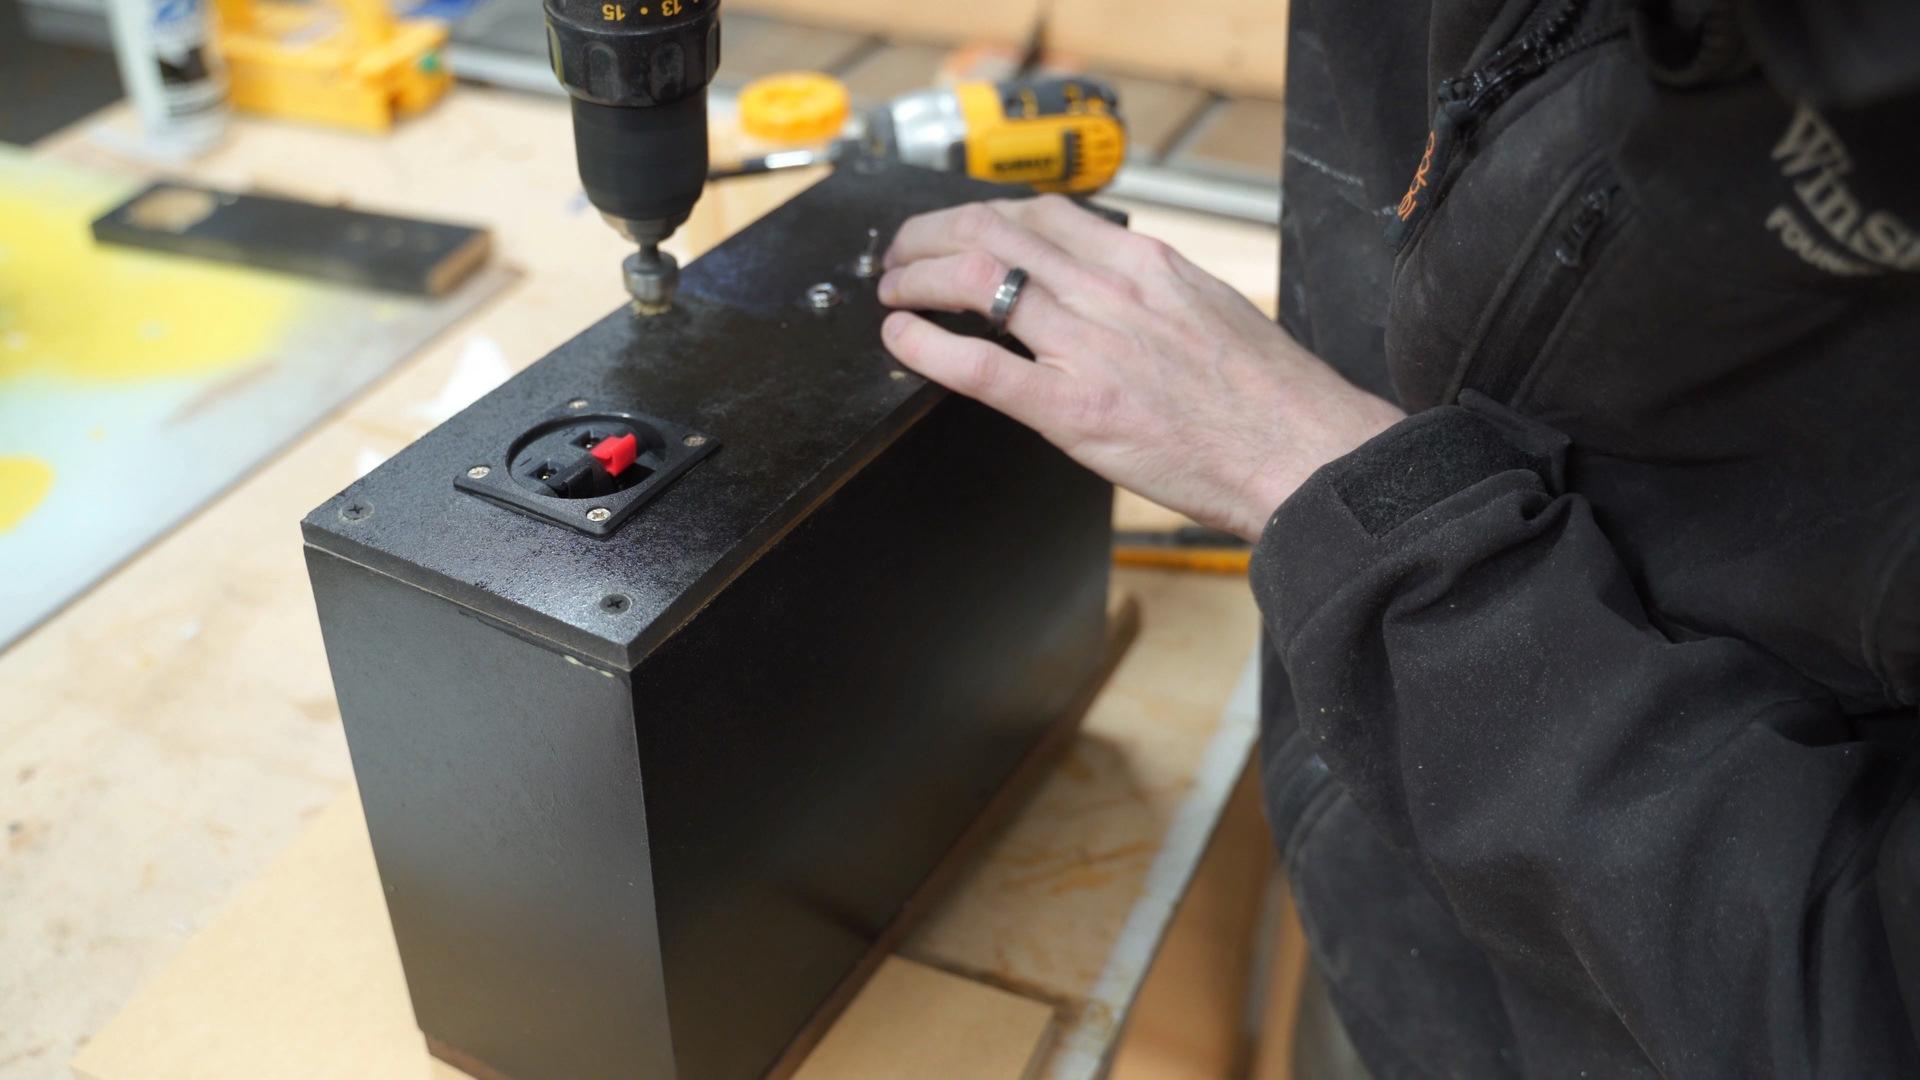 Countersink holes on the speaker back